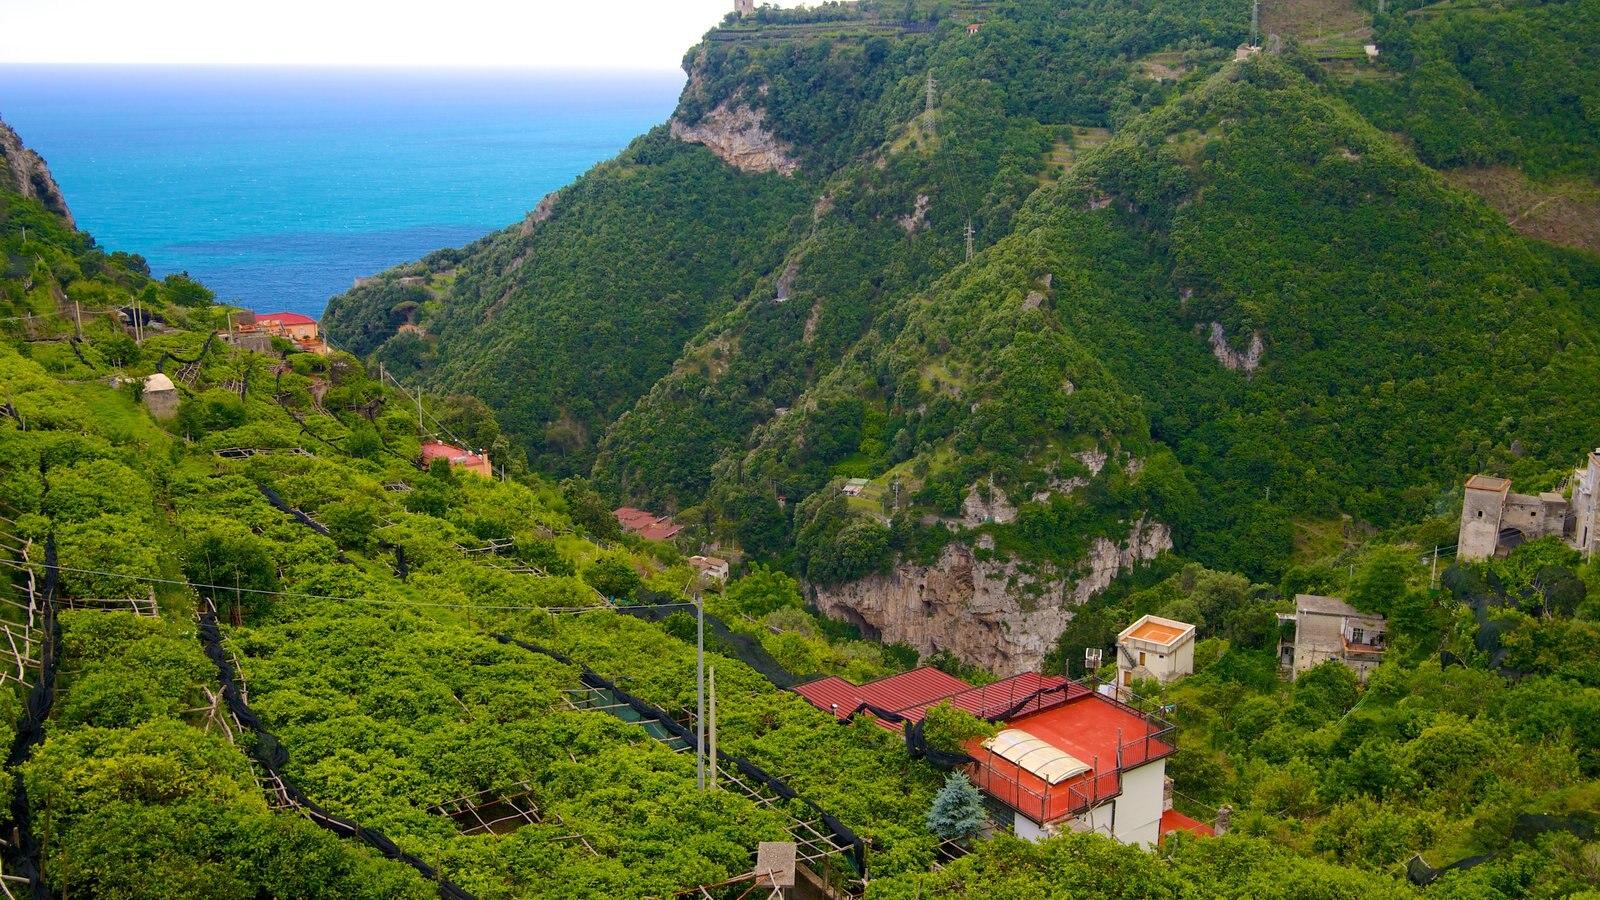 Pontone which includes general coastal views, farmland and mountains